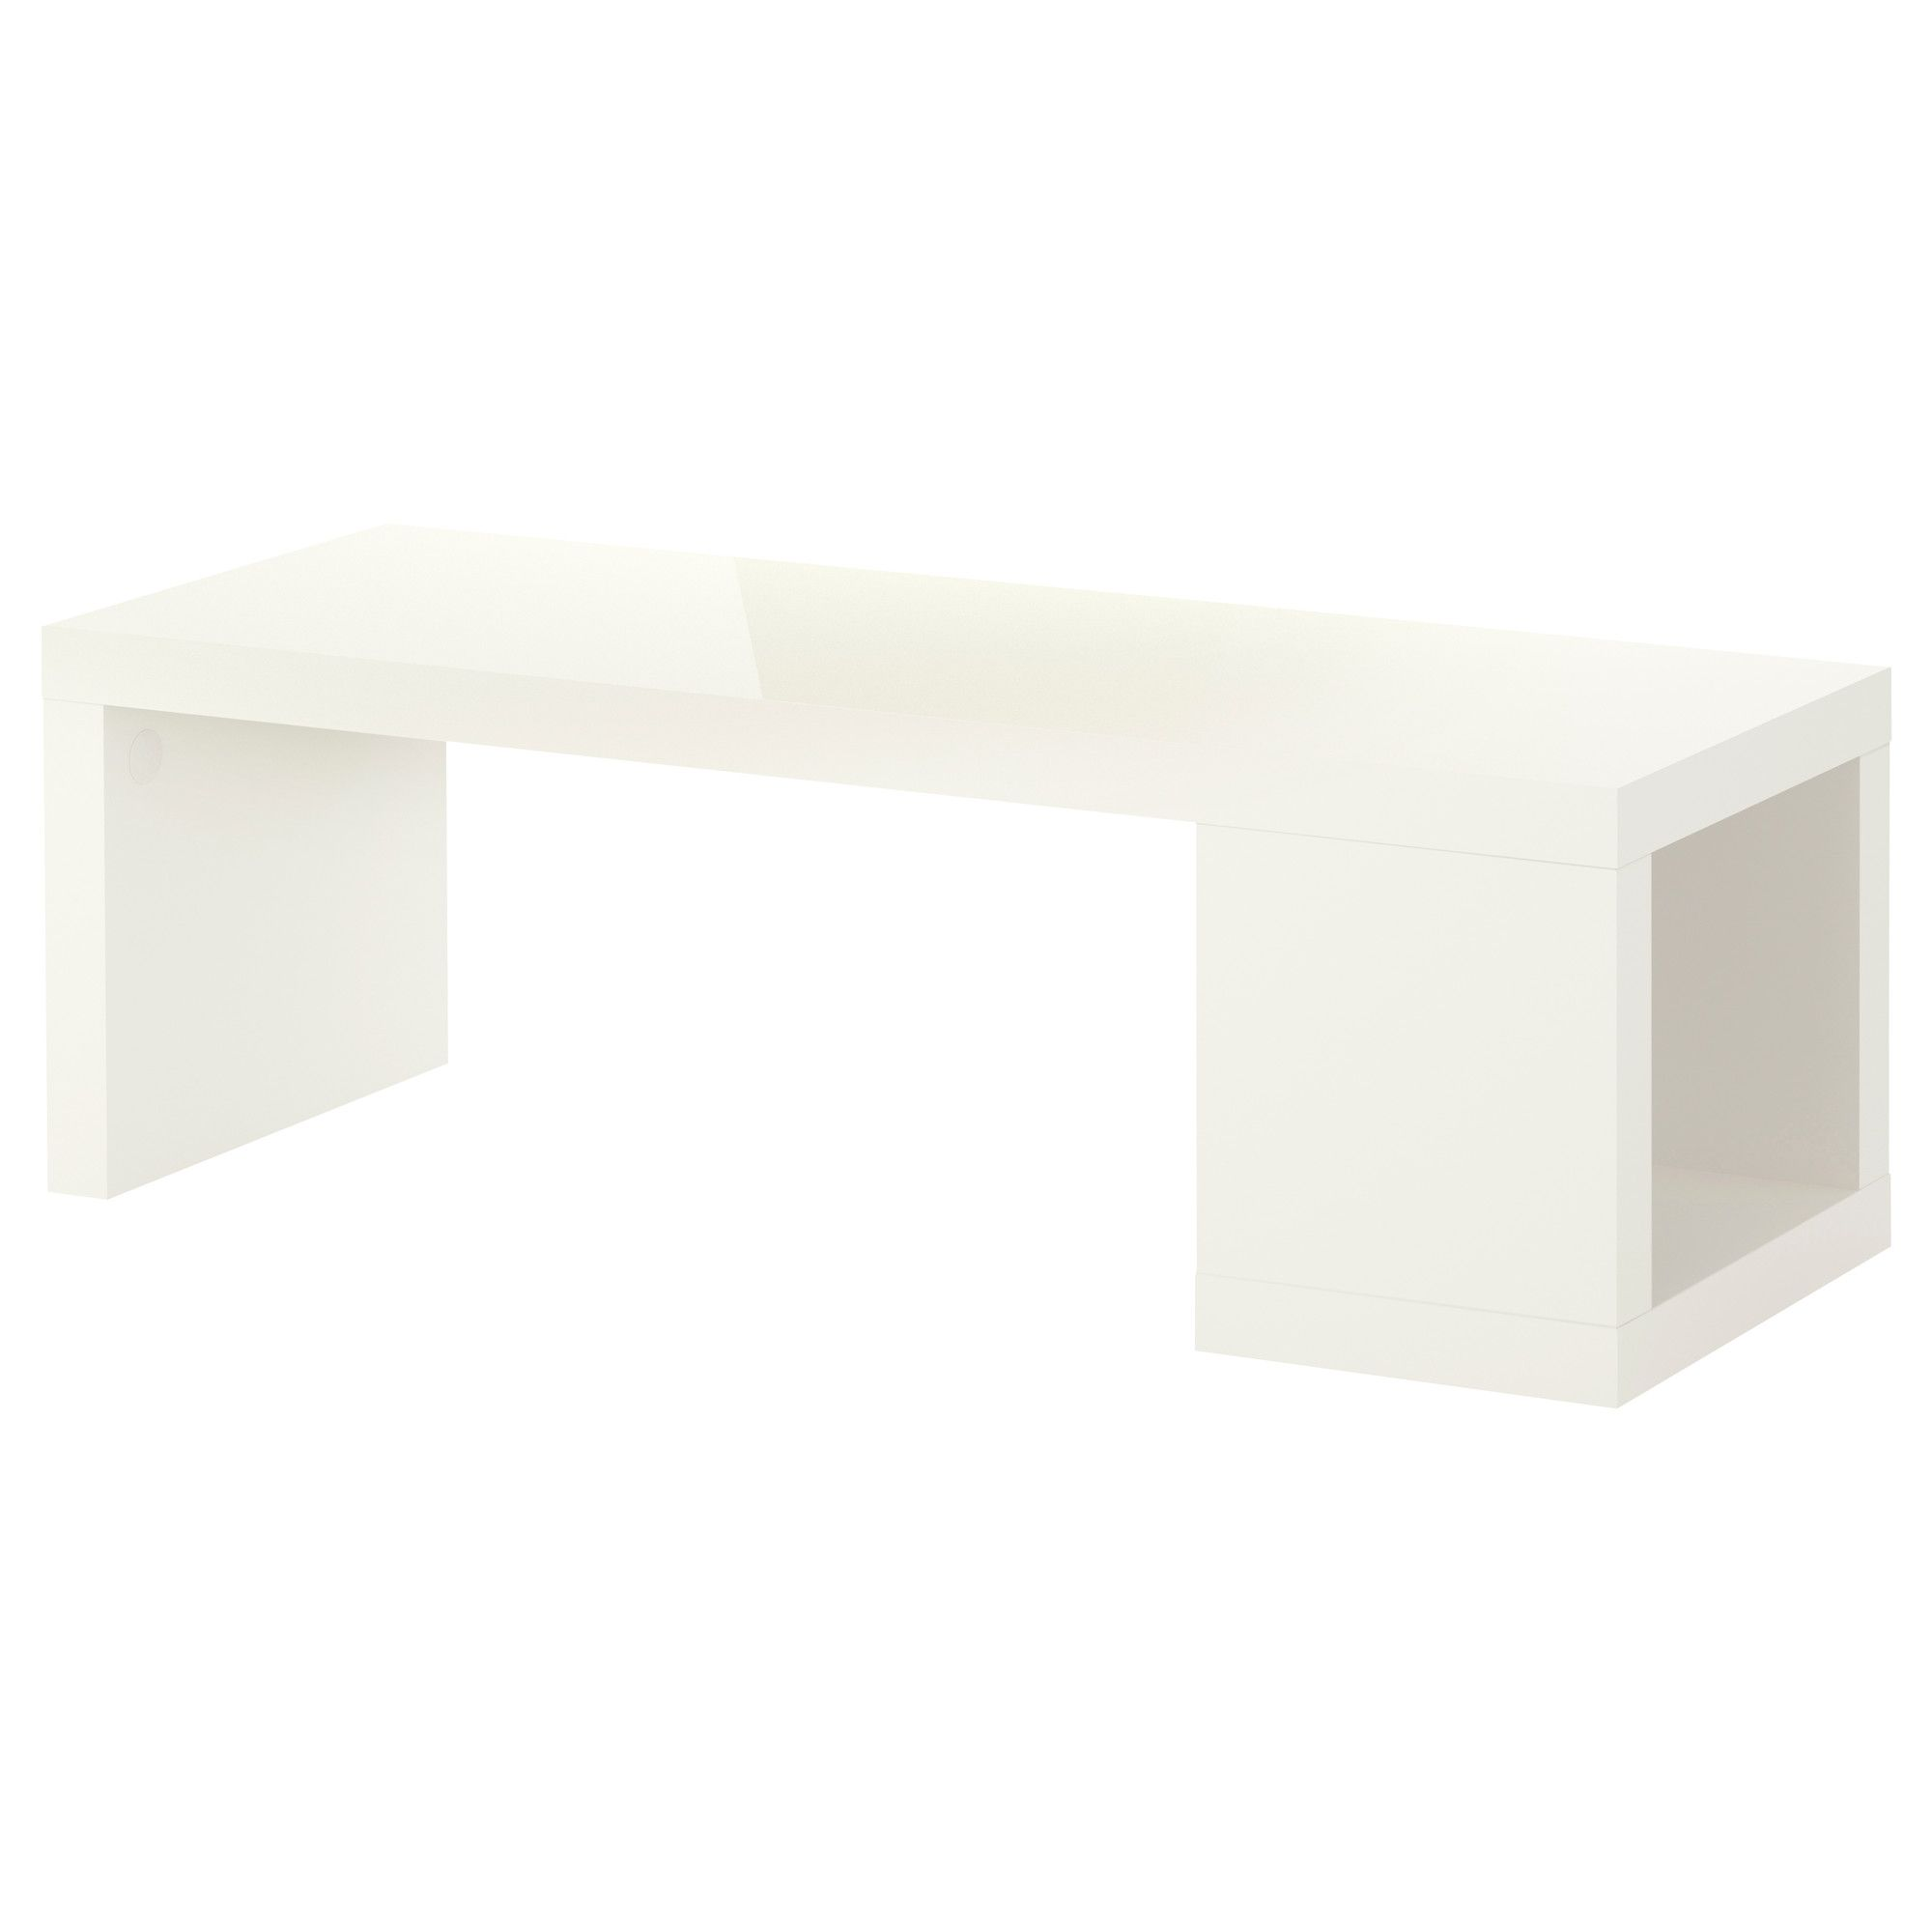 Furniture And Home Furnishings Ikea Lack Coffee Table Ikea Kids